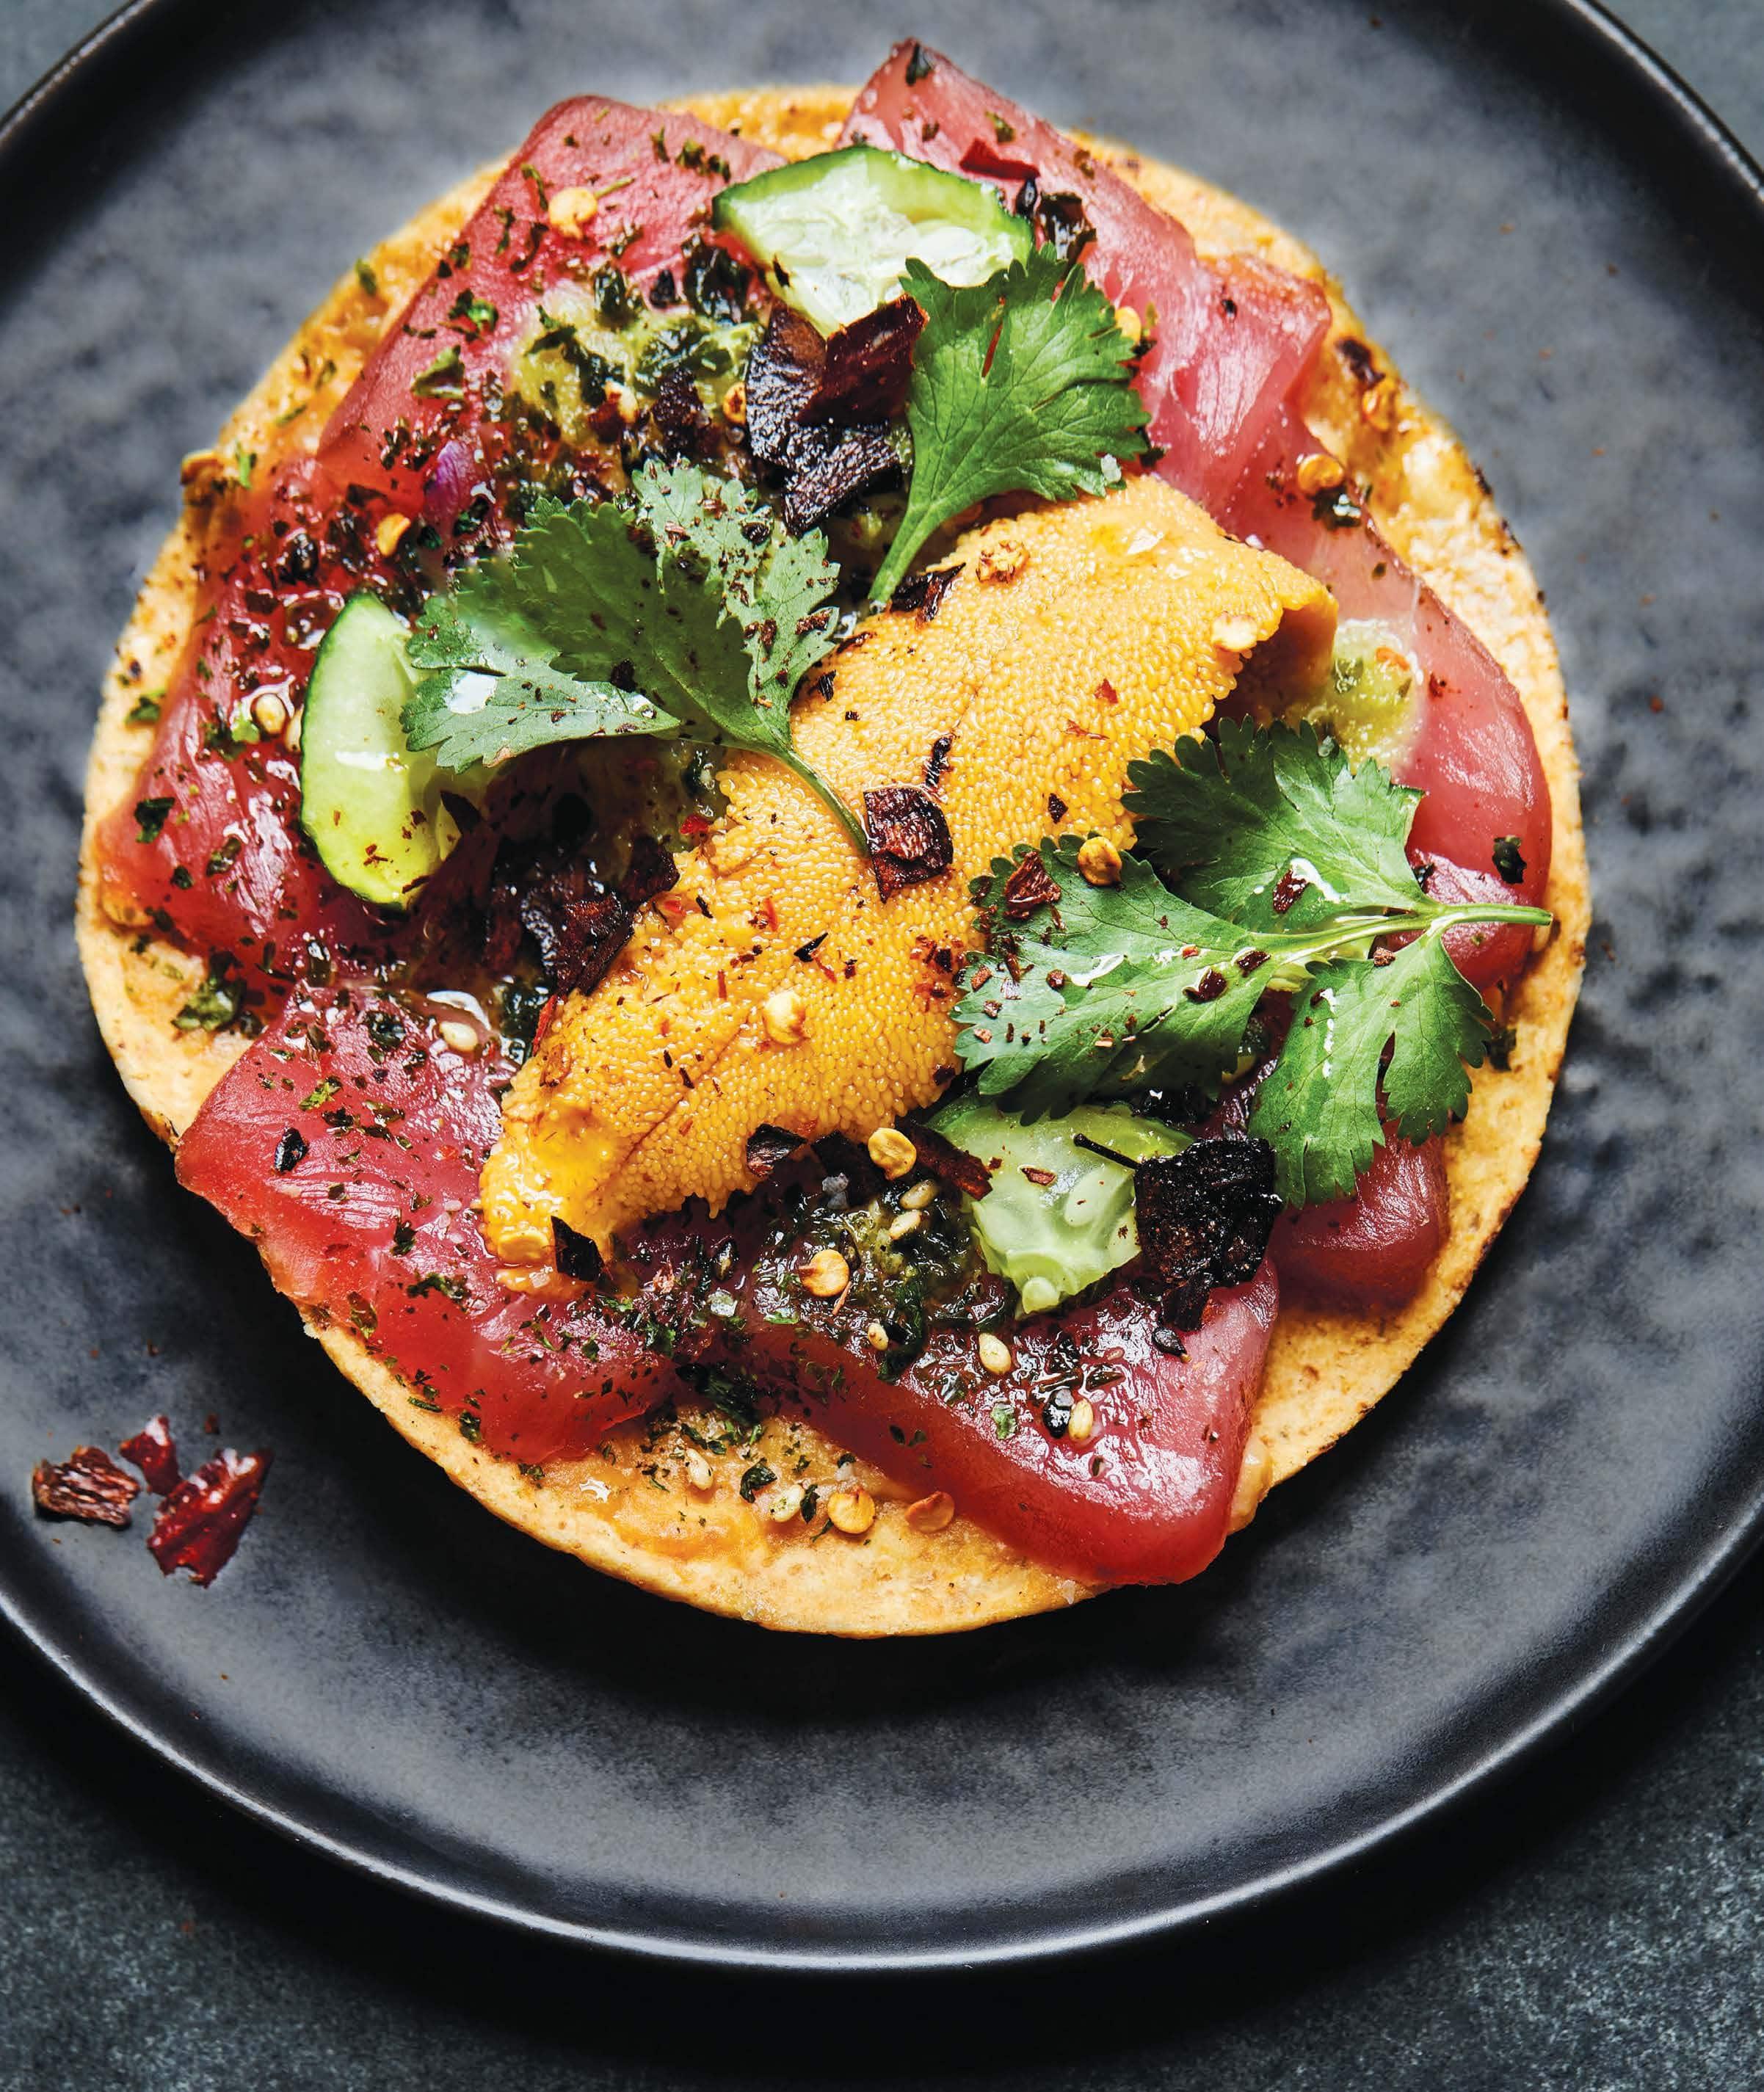 Recipe: Tuna Poke and Sea Urchin Tostadas